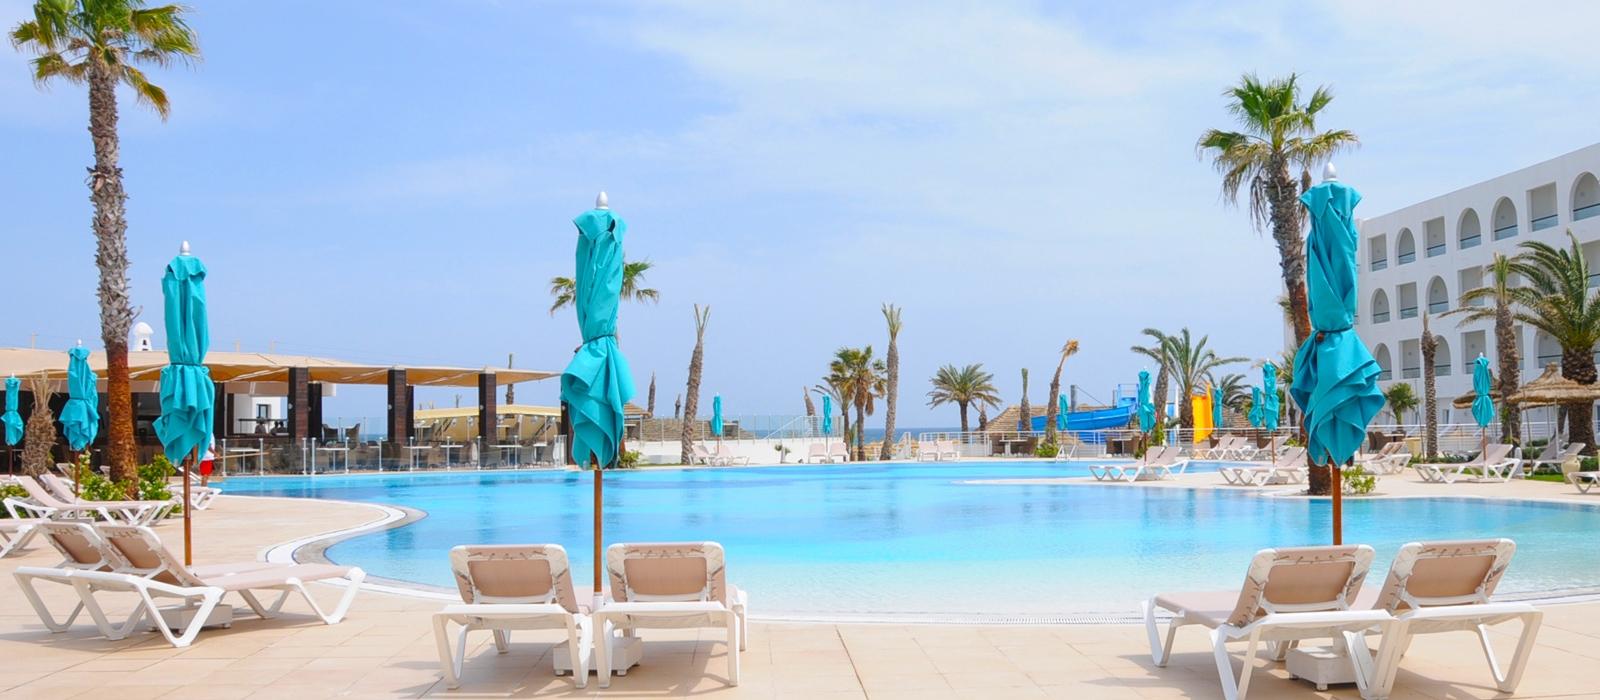 Piscina Exterior - Hamammet Nozha Beach Hotel